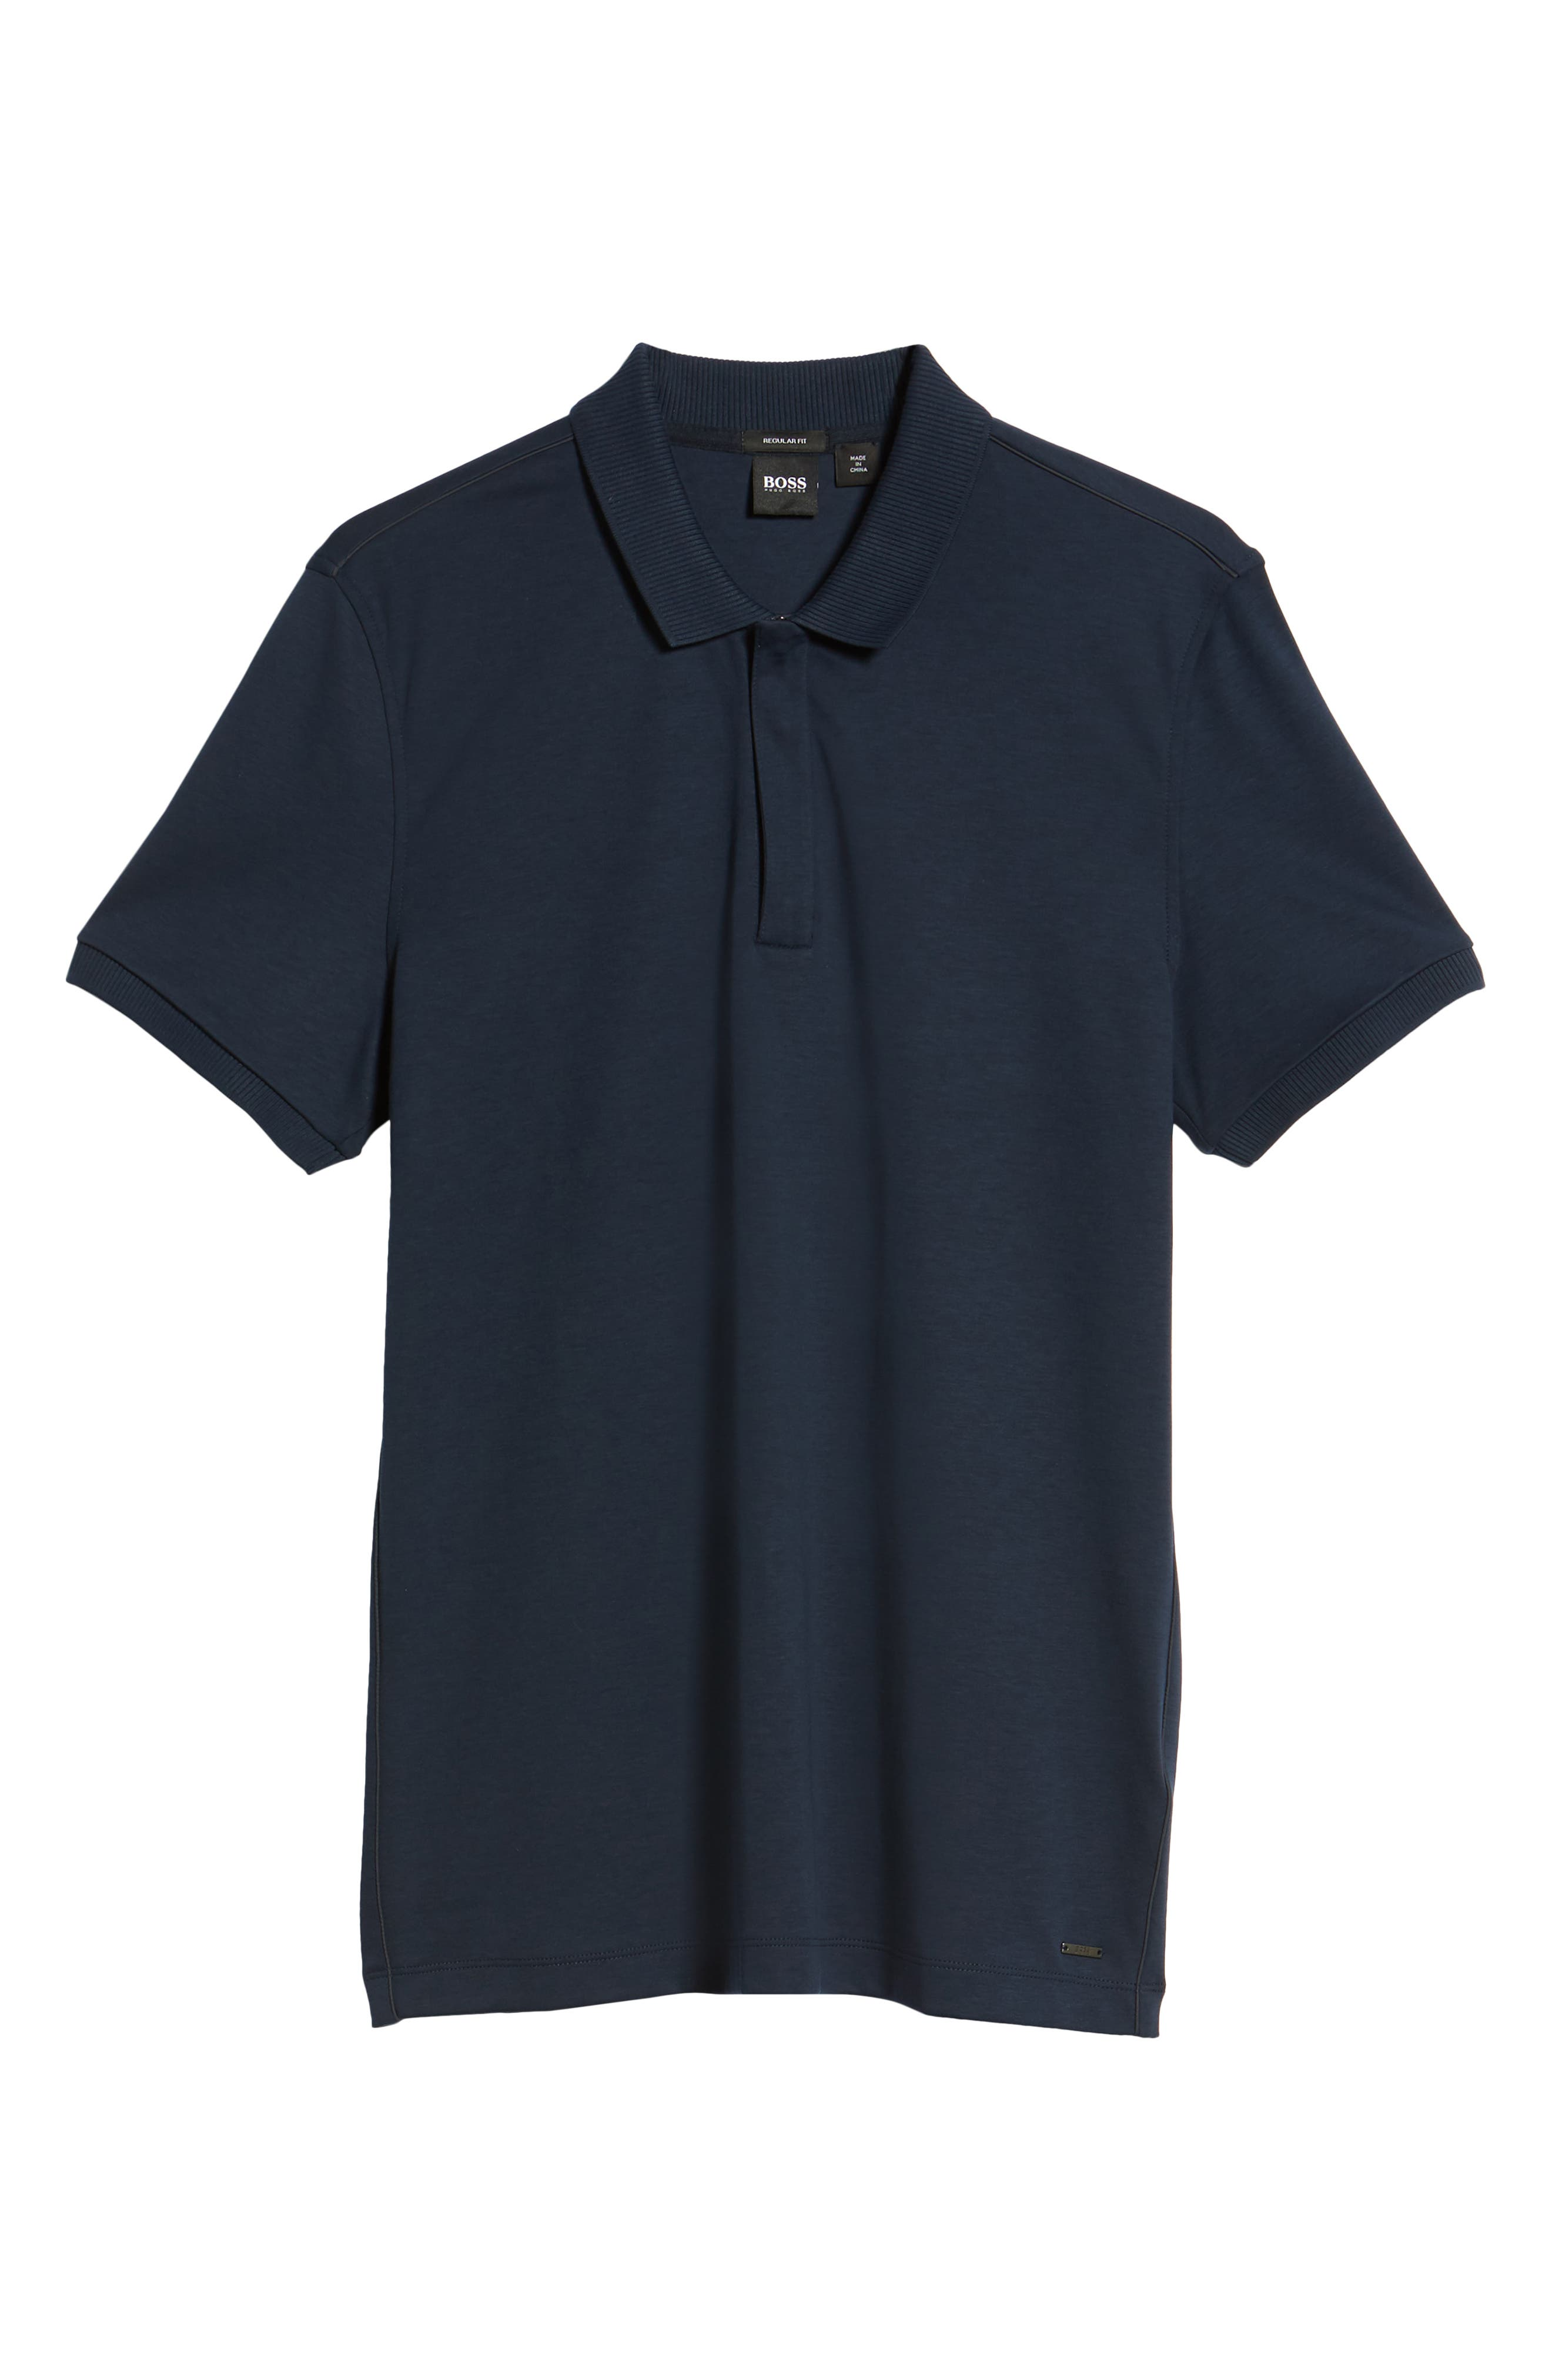 Pohl Polo Shirt,                             Alternate thumbnail 6, color,                             Blue